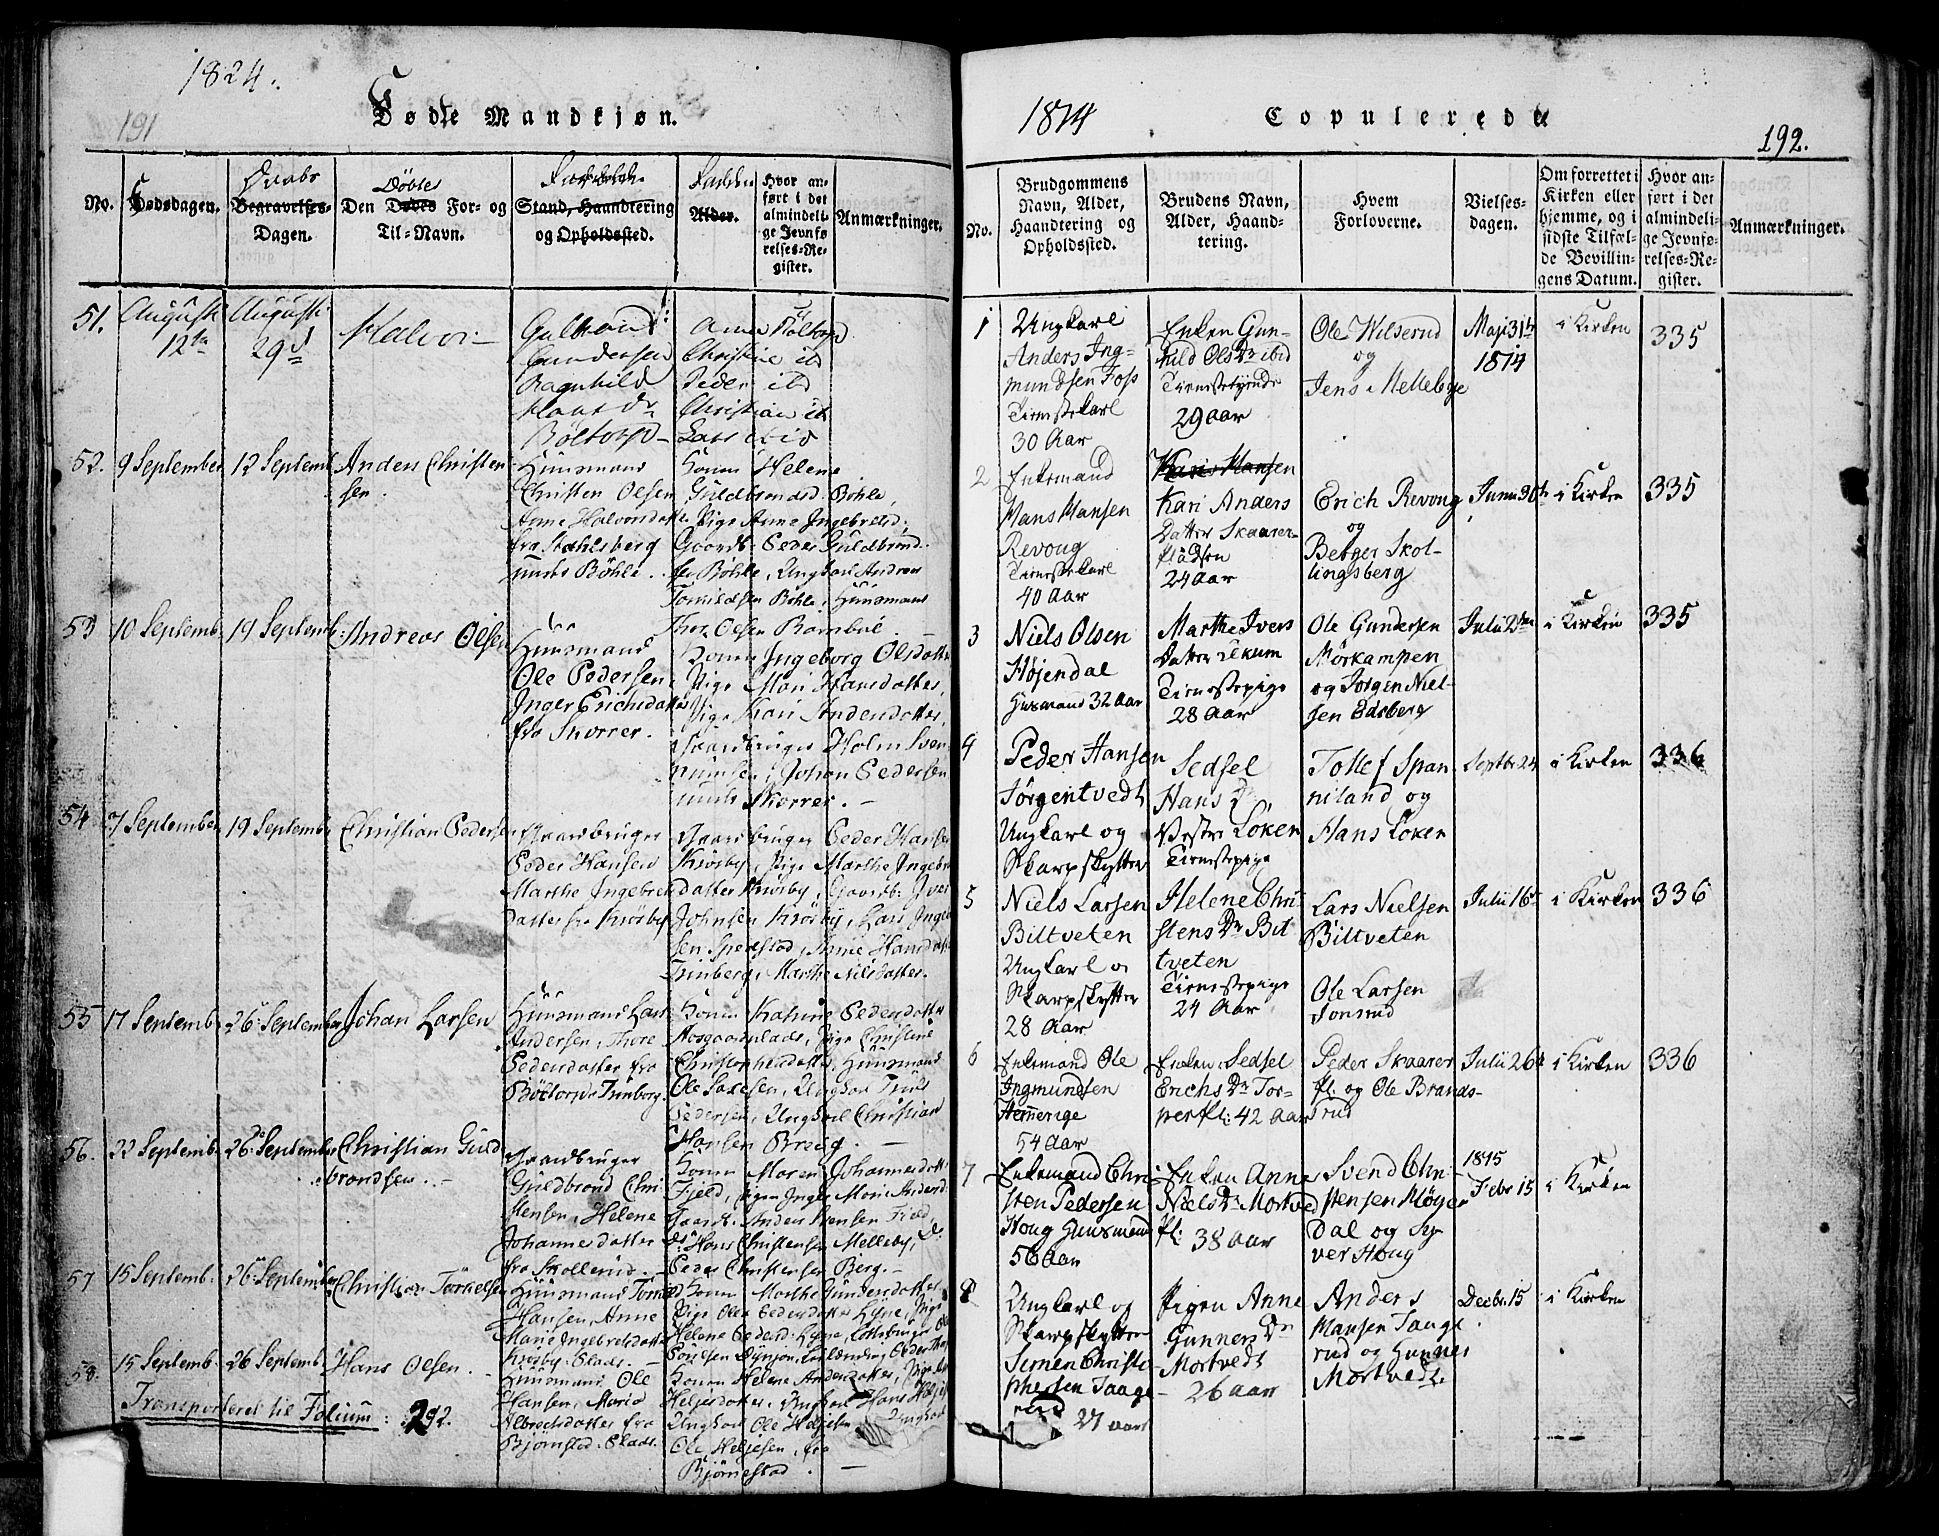 SAO, Eidsberg prestekontor Kirkebøker, F/Fa/L0007: Parish register (official) no. I 7, 1814-1832, p. 192